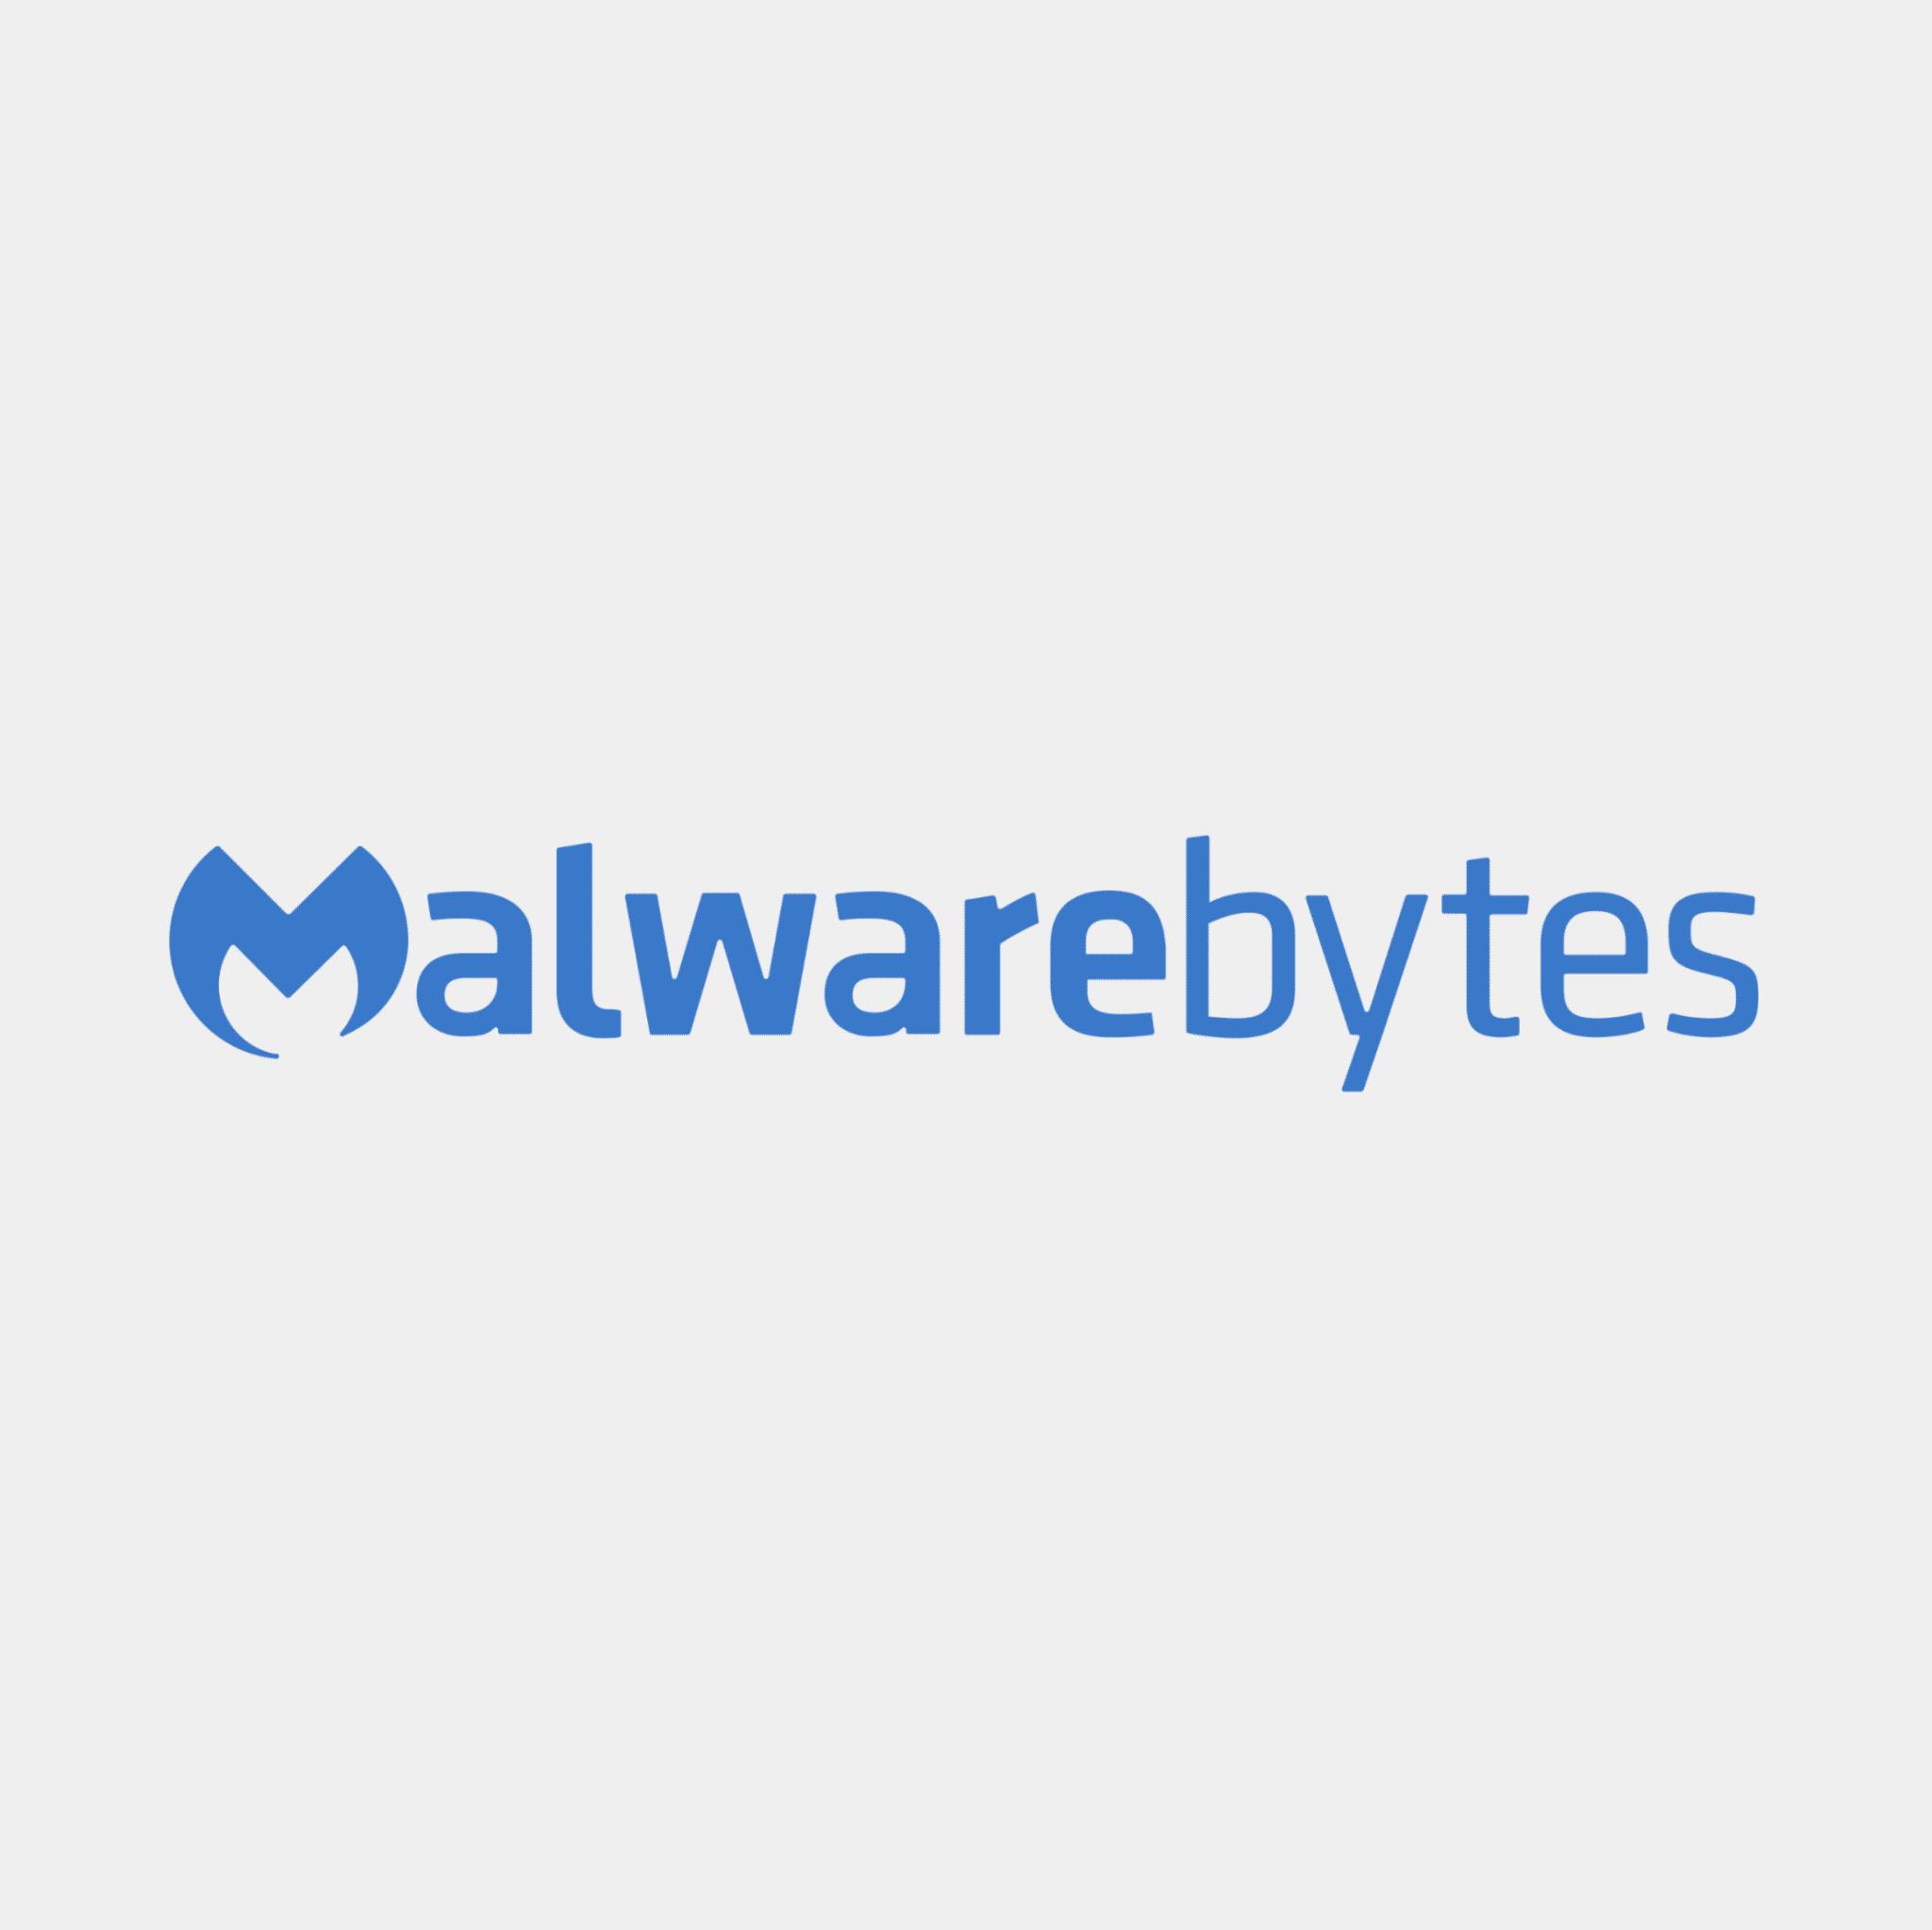 The logo for Malwarebytes.